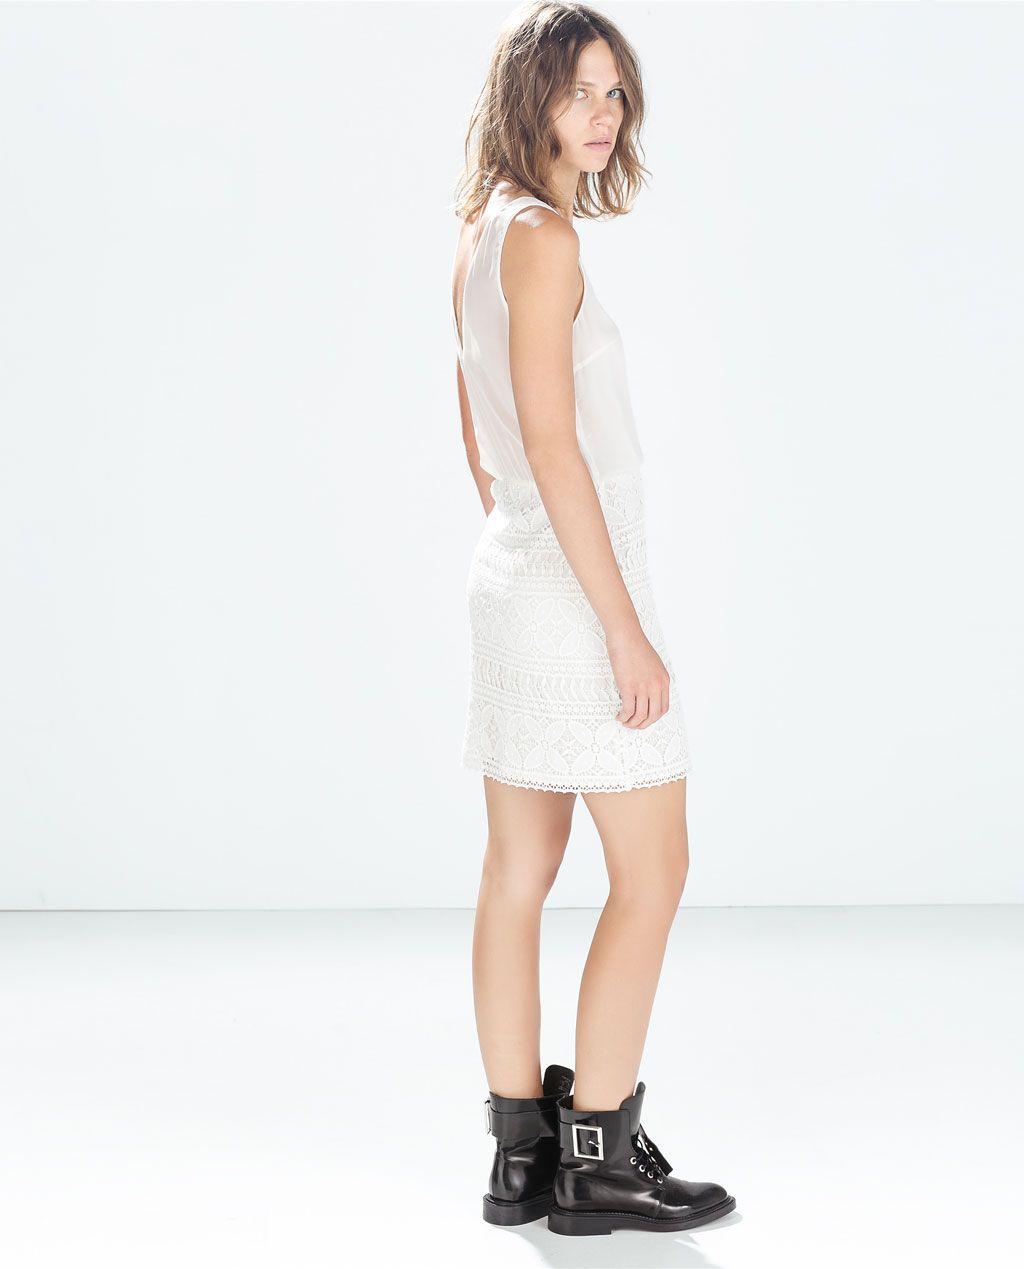 White lace dress zara  ZARA  NEW THIS WEEK  MIXED FABRICS DRESS  WL  Pinterest